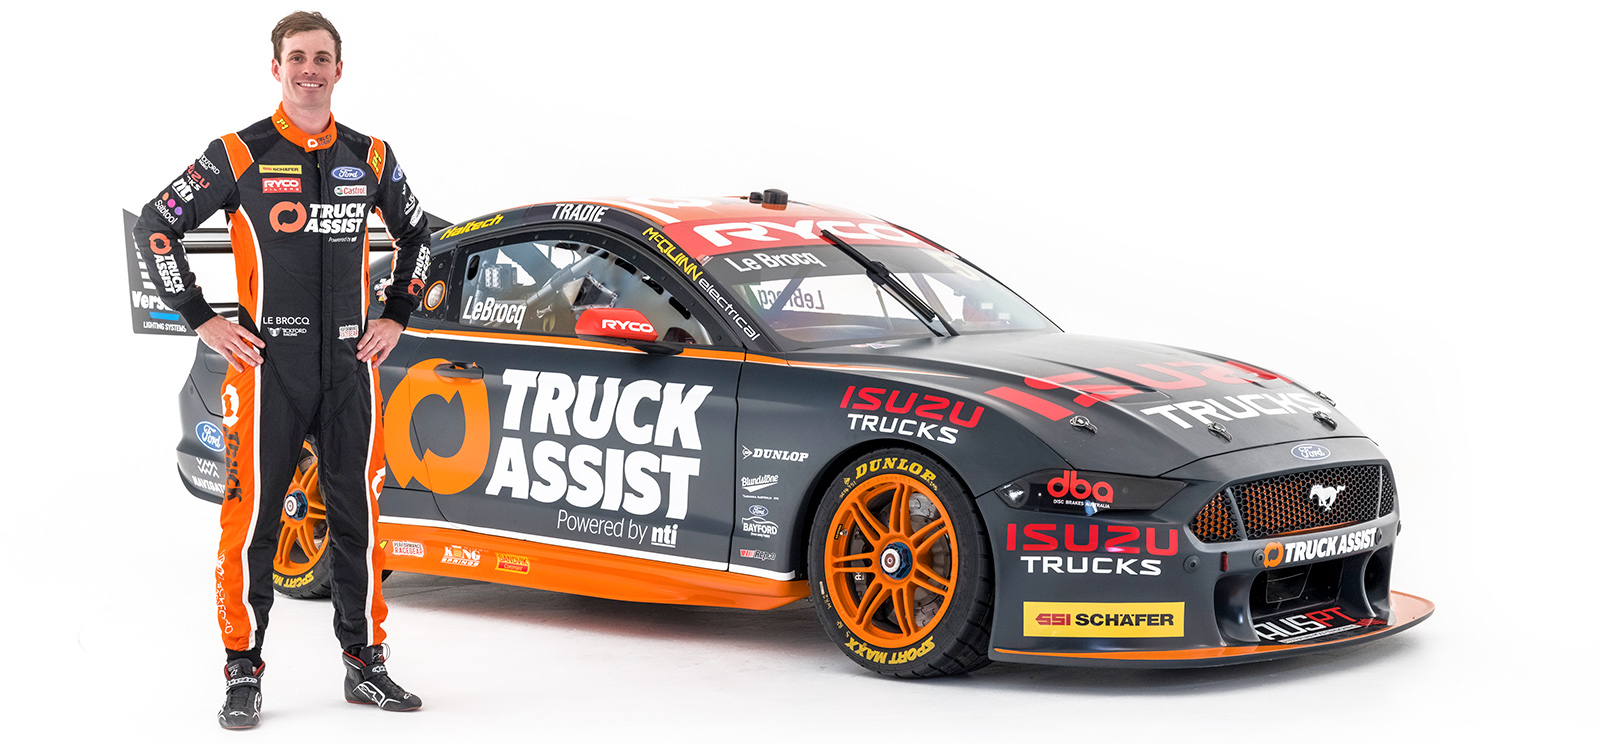 jlb-truck-assist